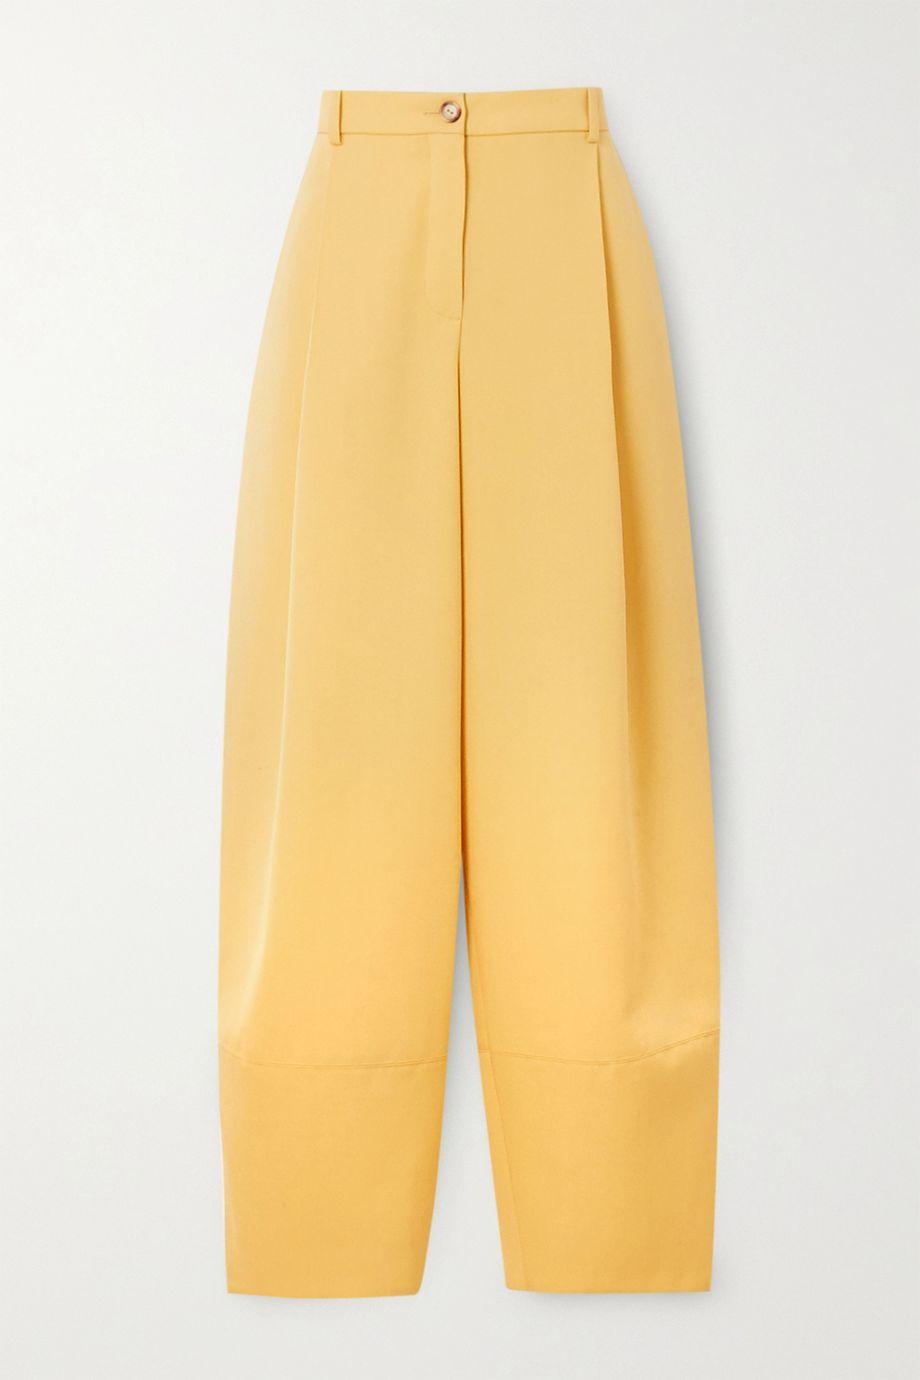 Nina Ricci Pleated grain de poudre wool tapered pants